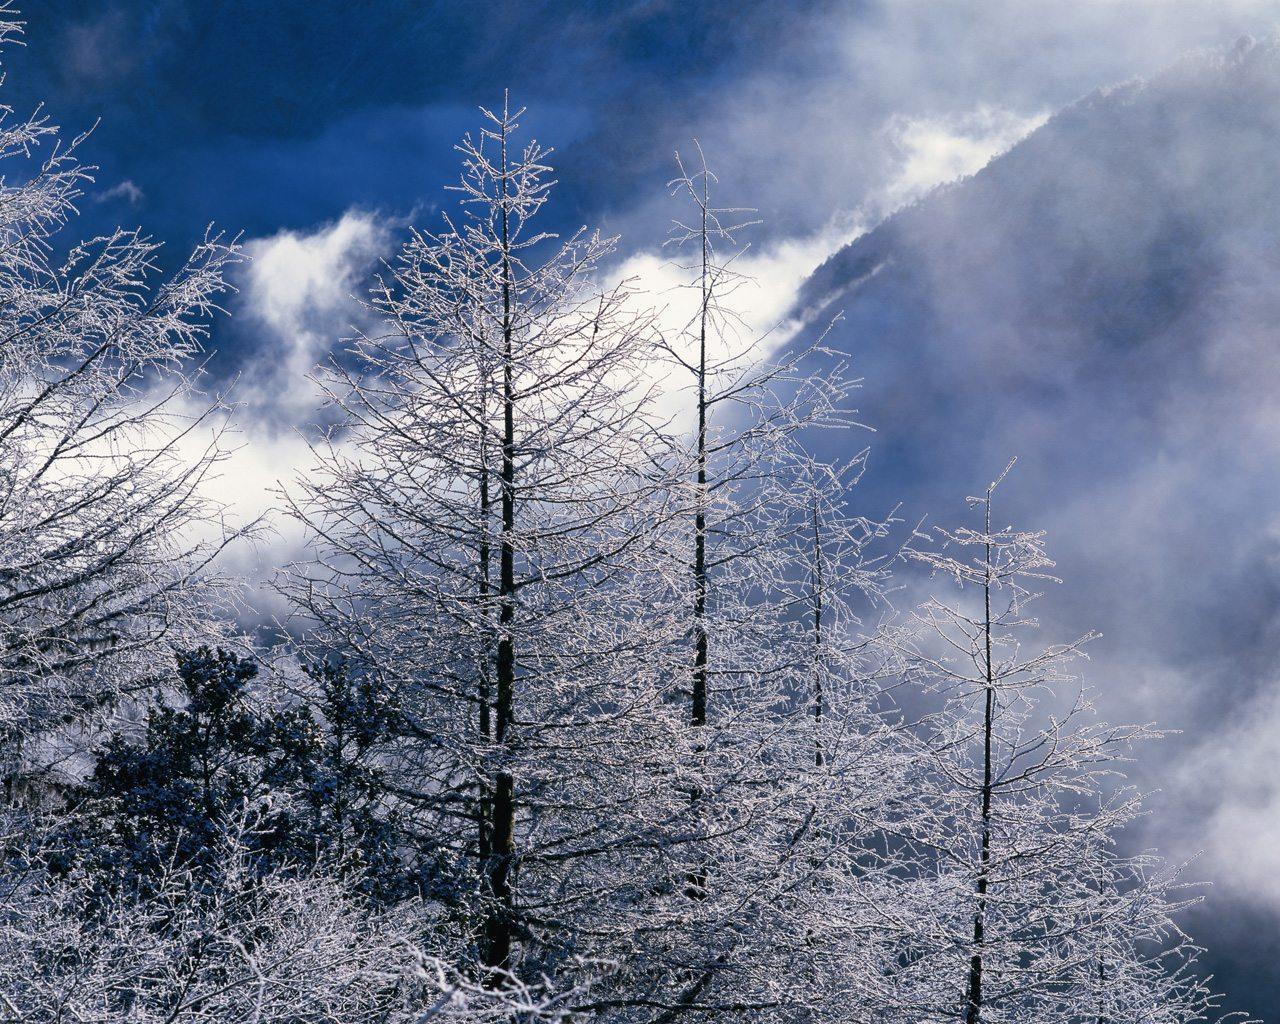 landscape pictures beautiful